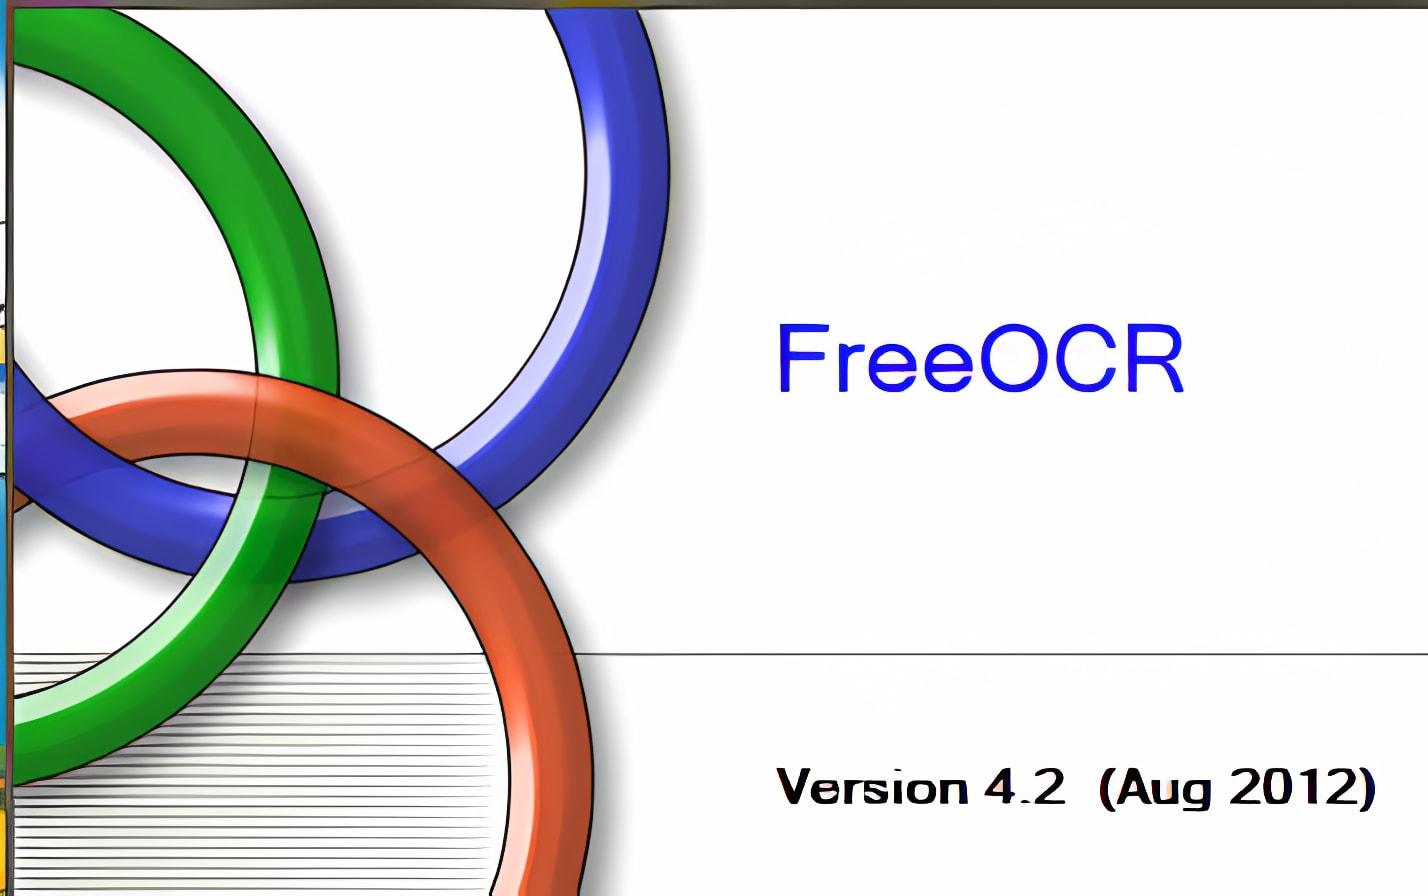 FreeOCR